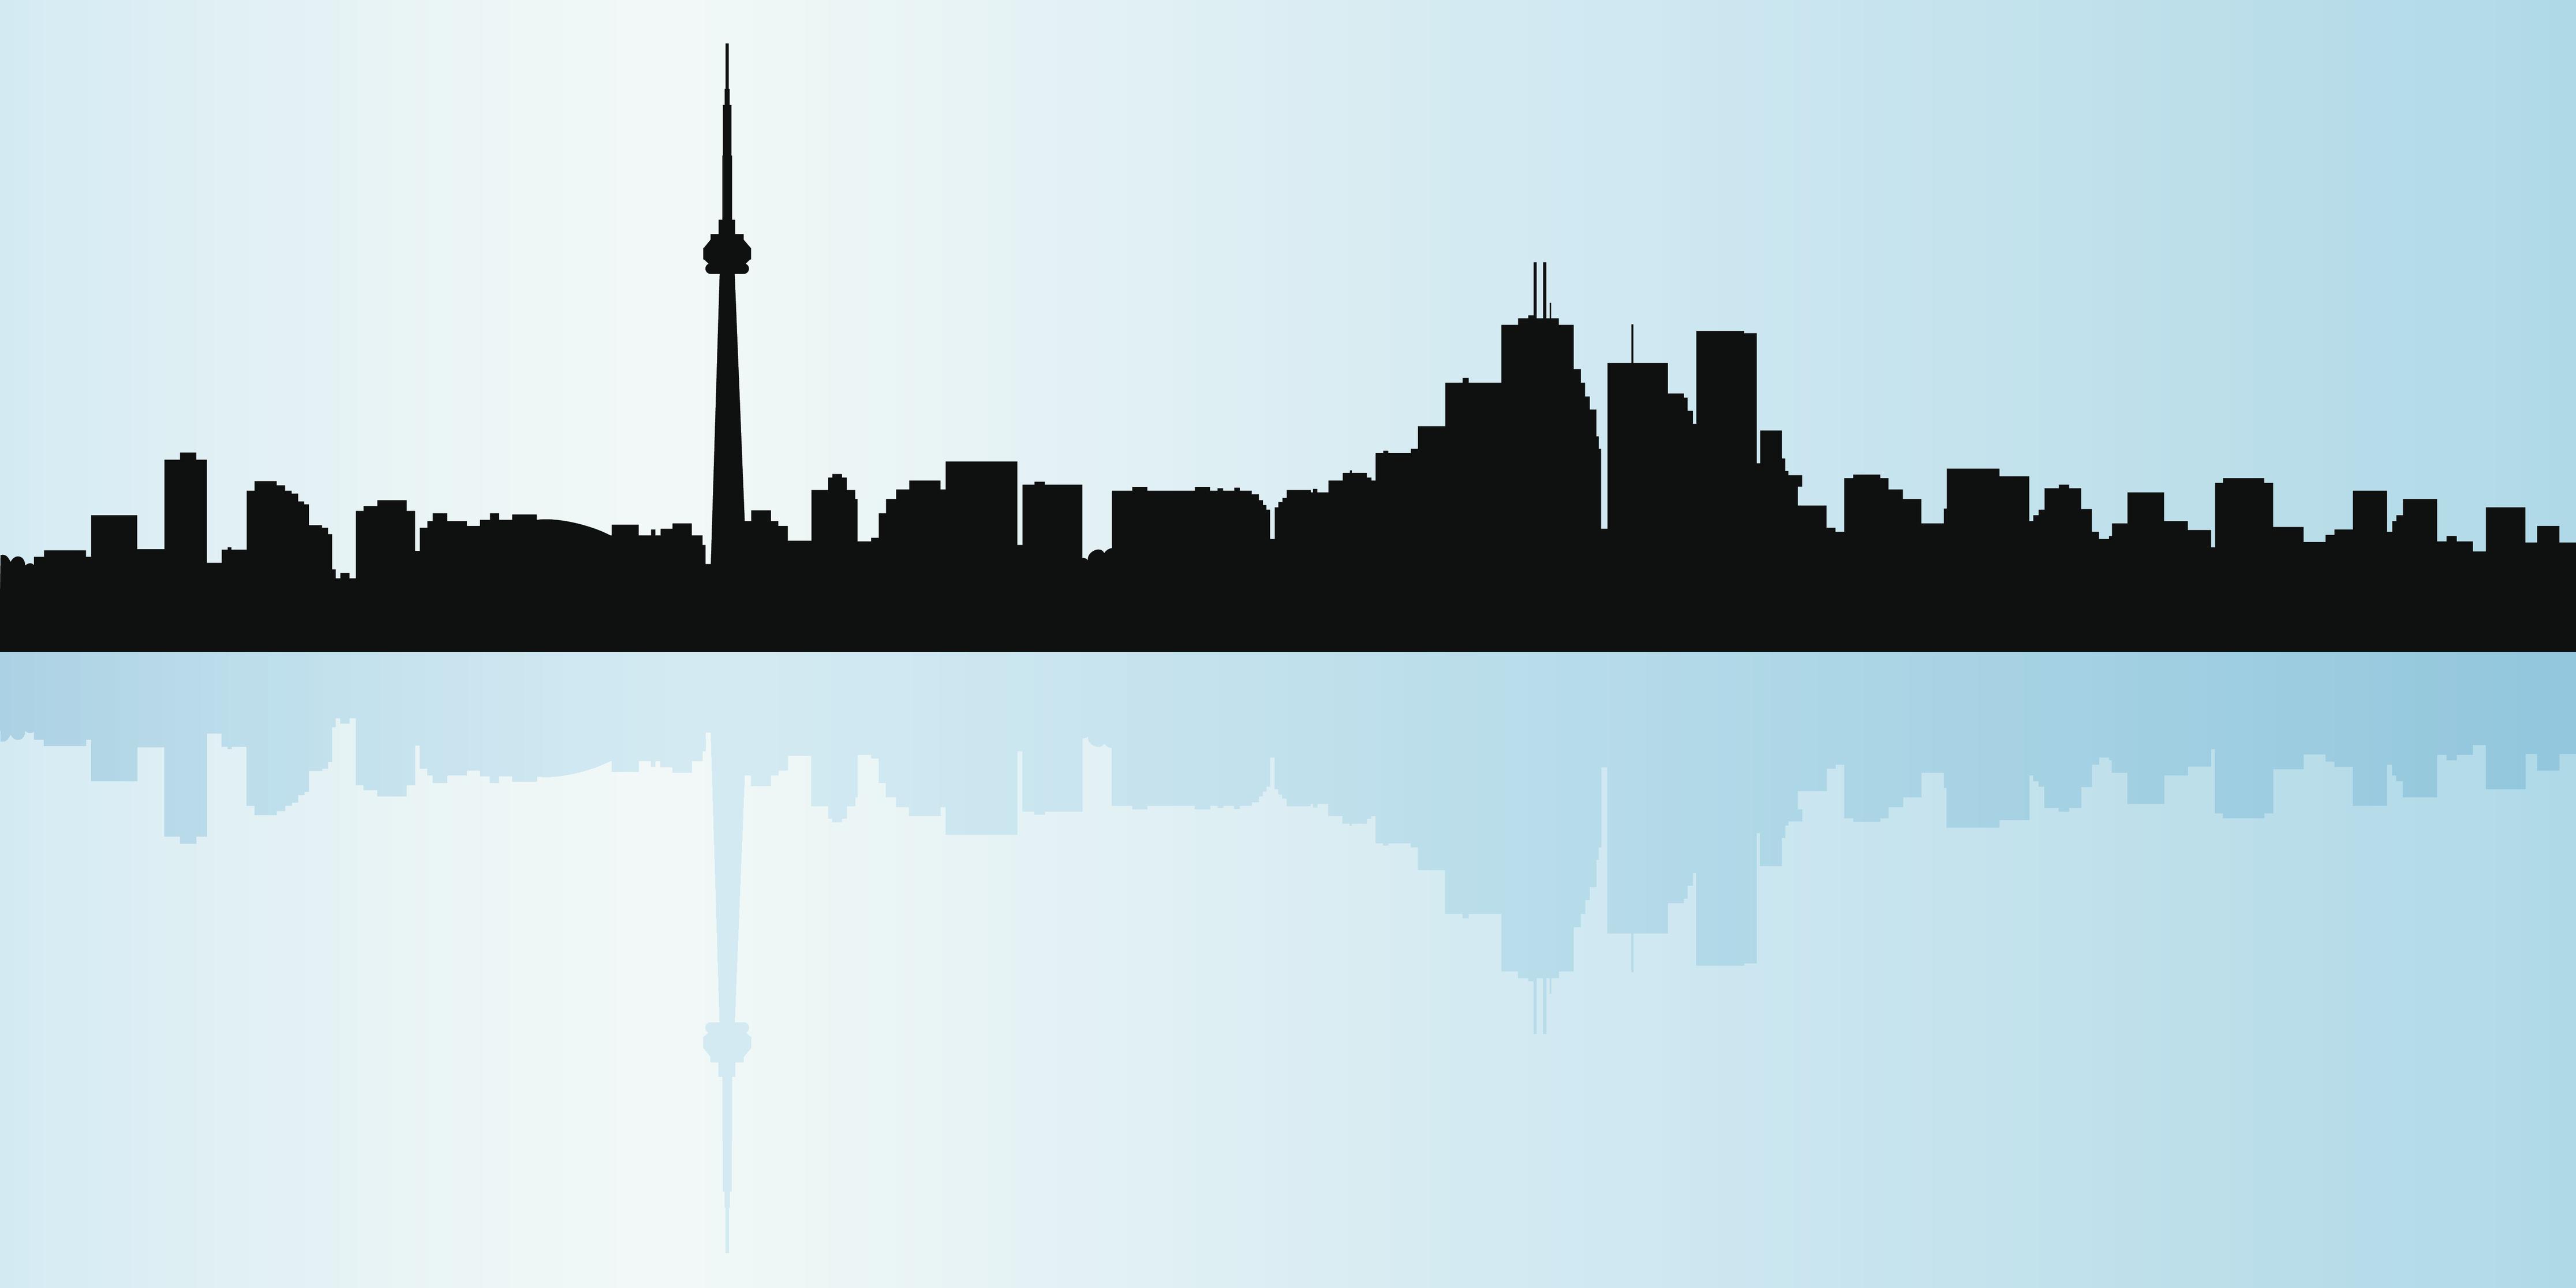 Toronto Skyline iStock-165487878-1